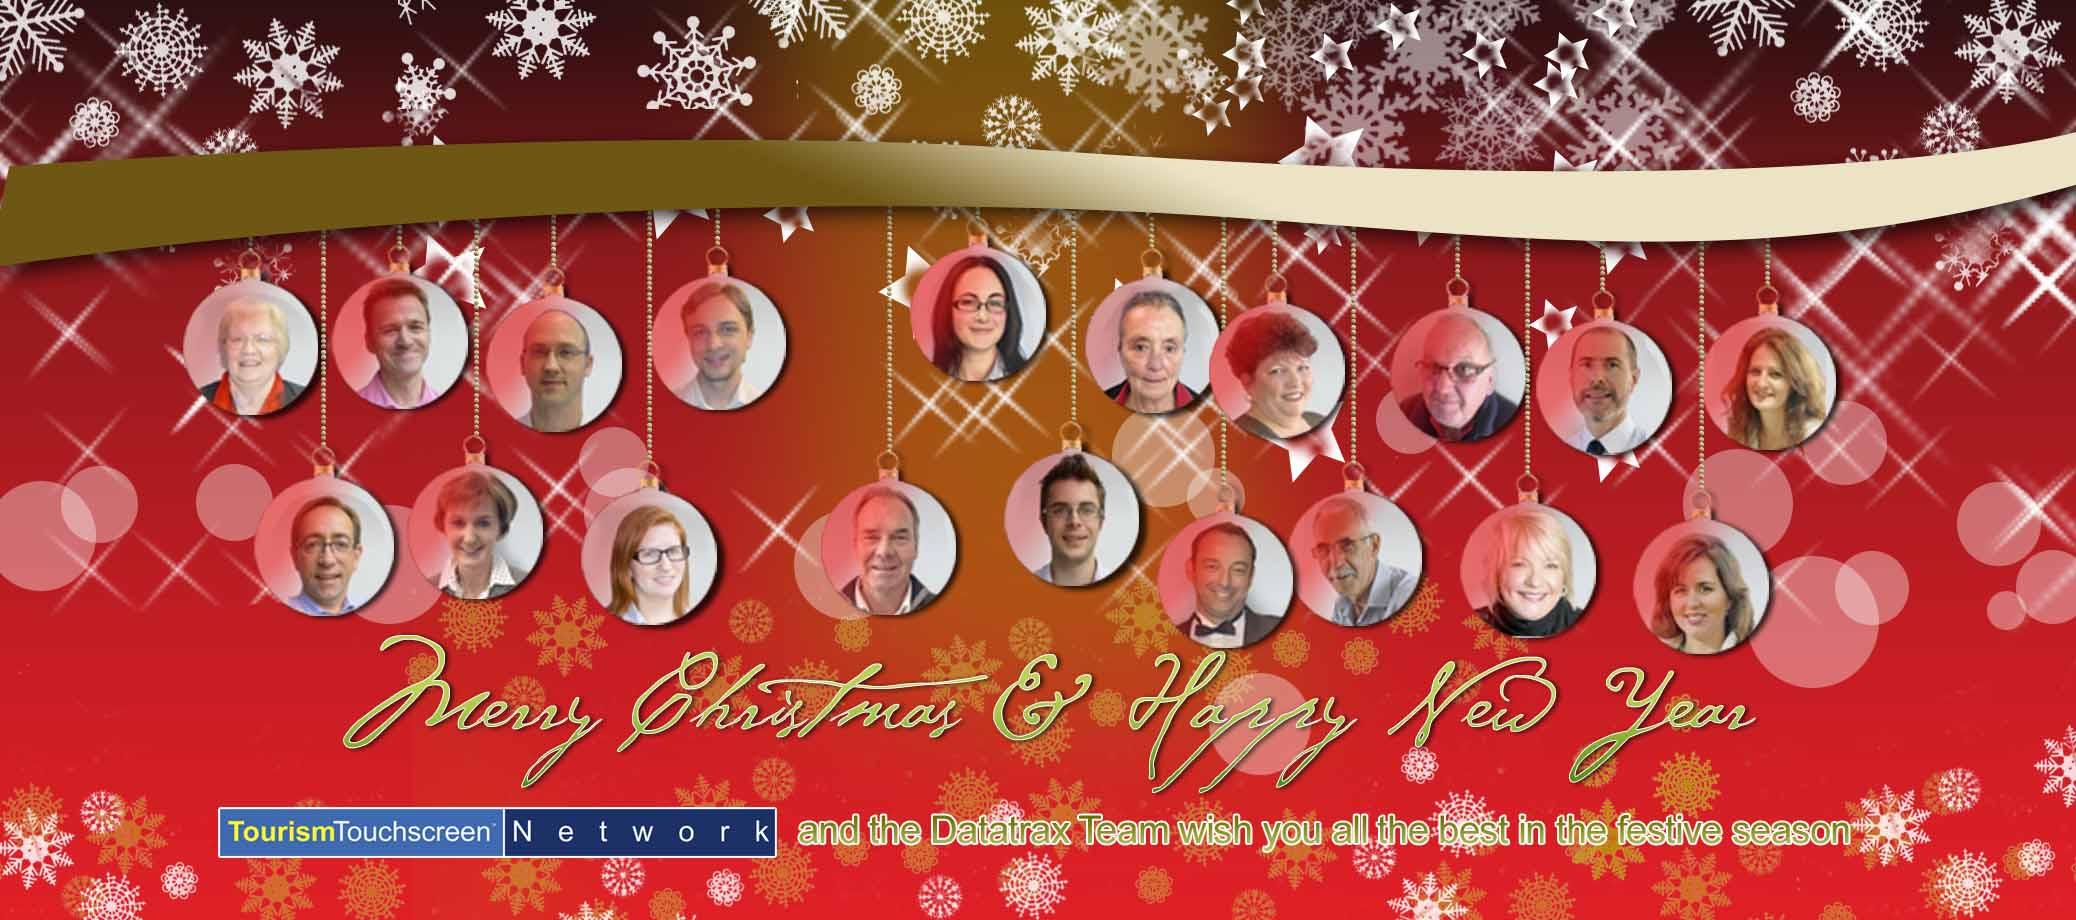 2014 Datatrax Team Christmas